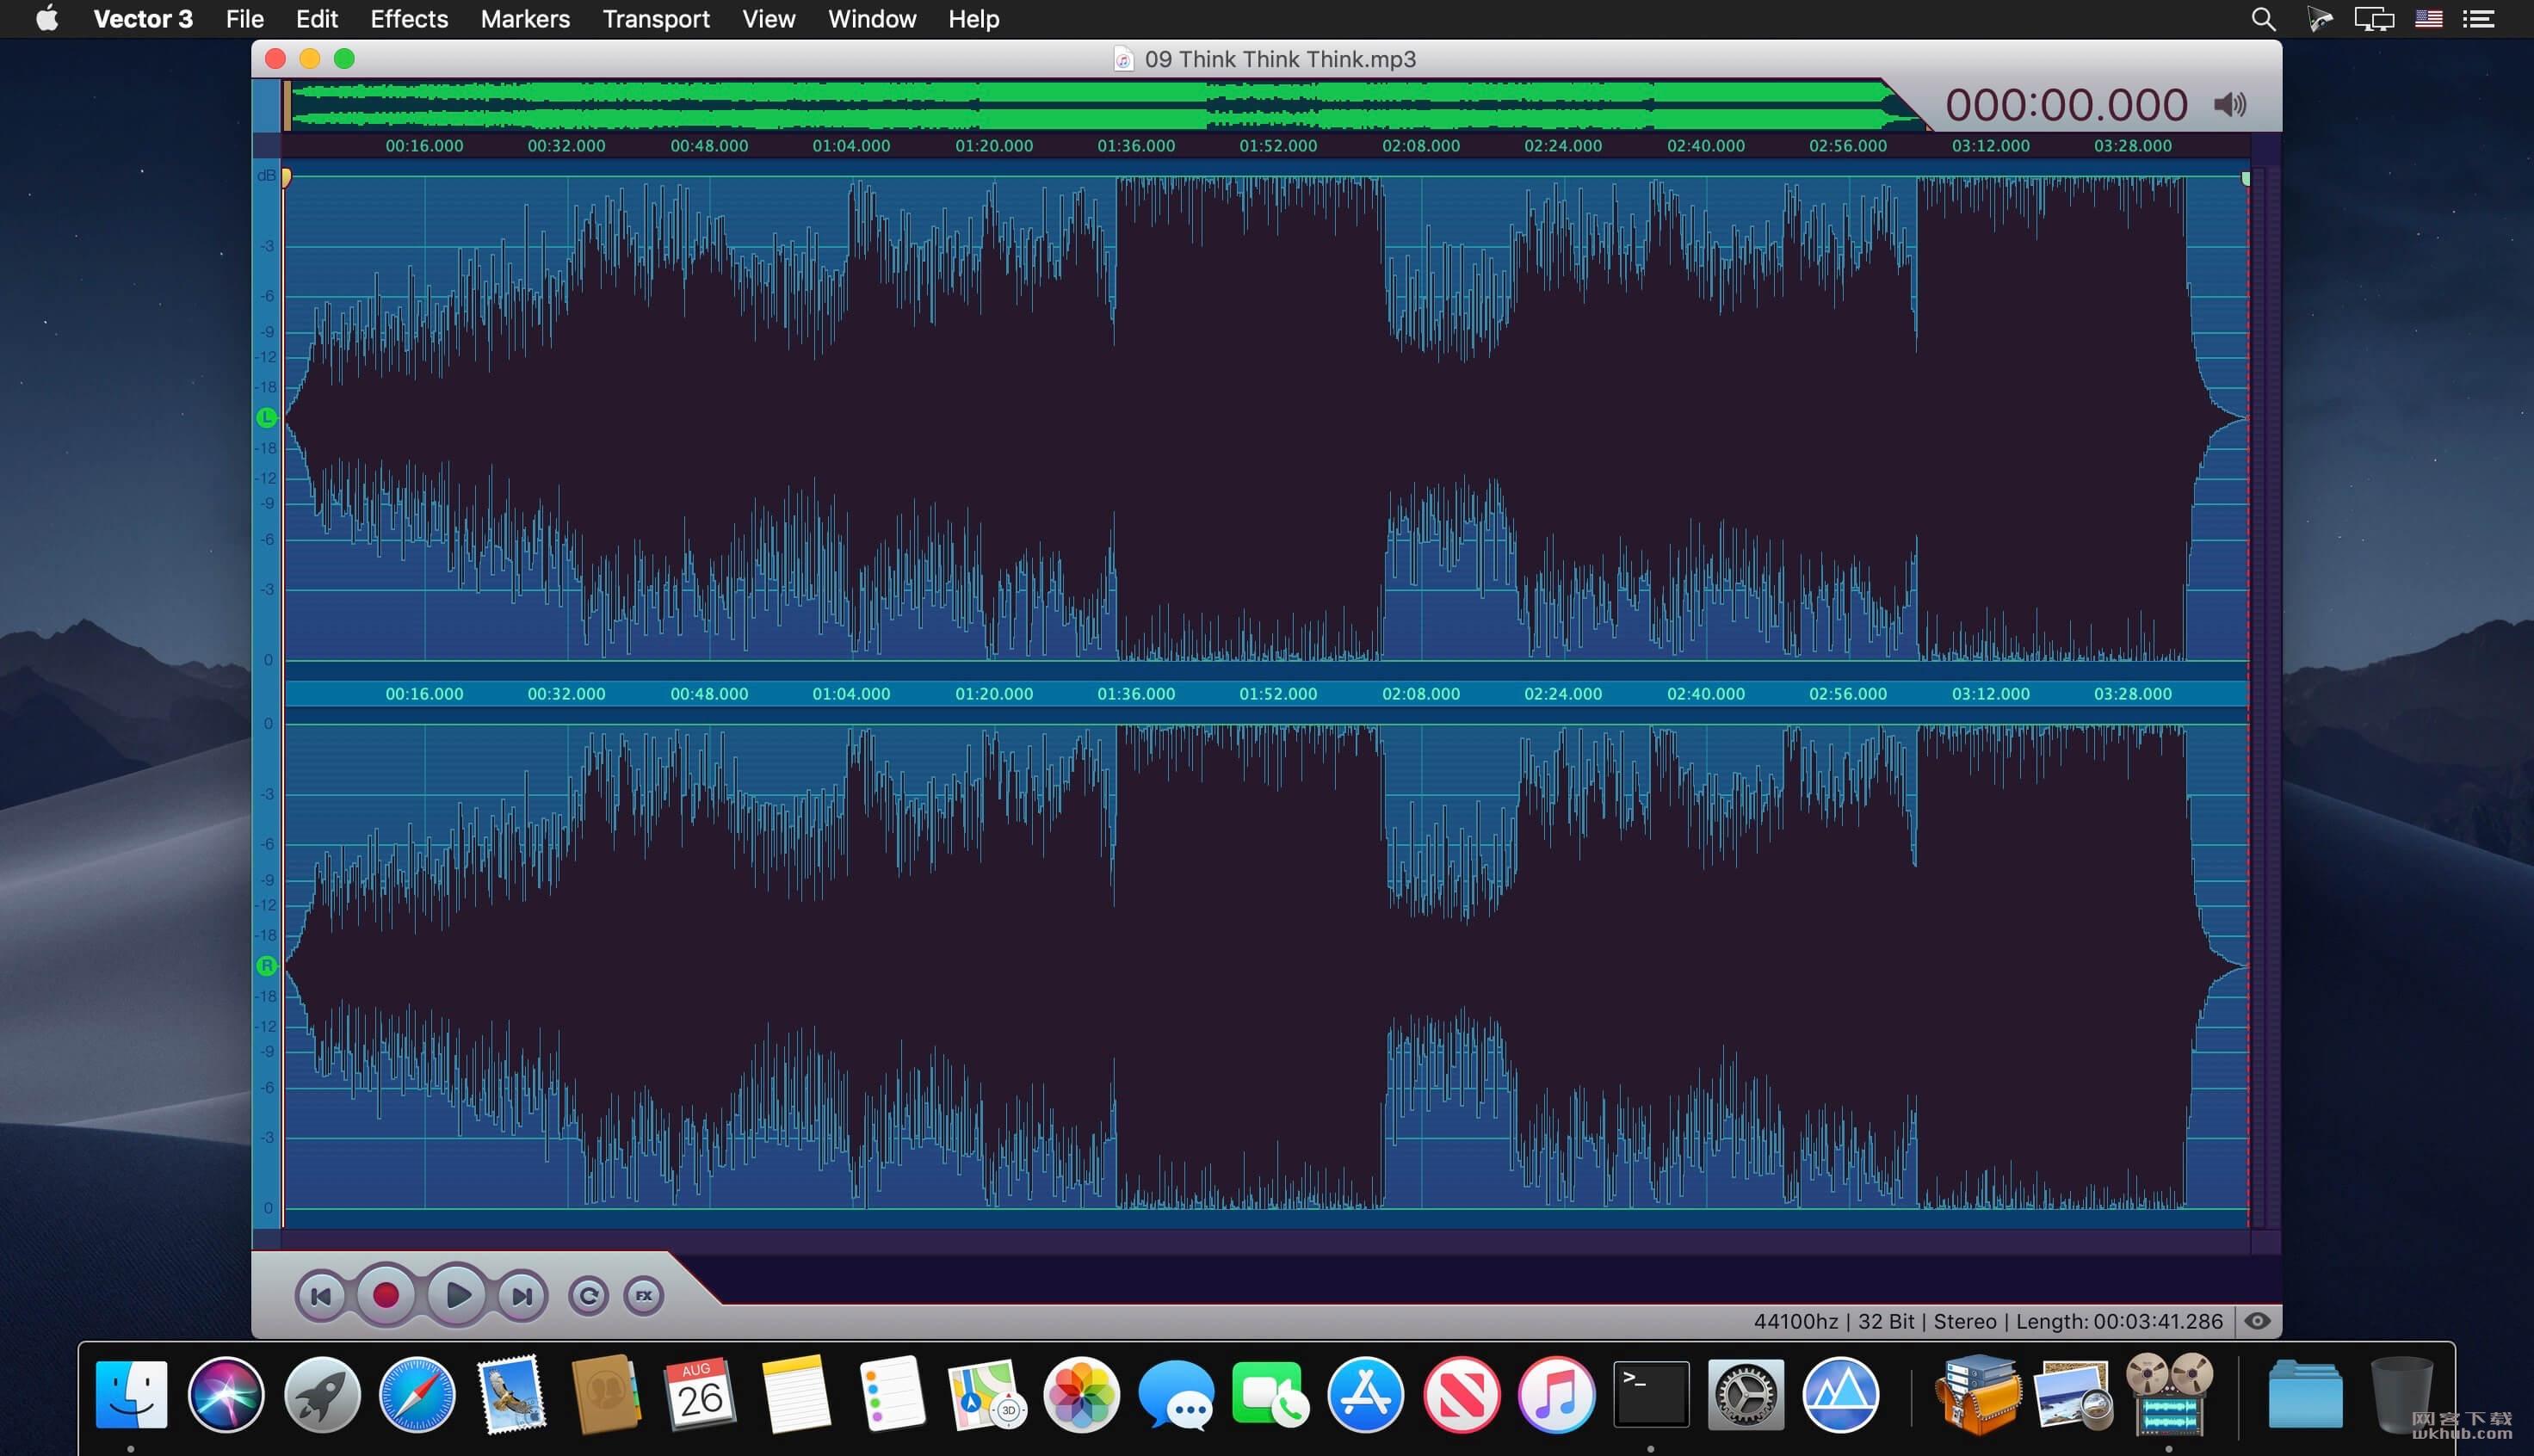 Vector 3.5 音频编辑工具